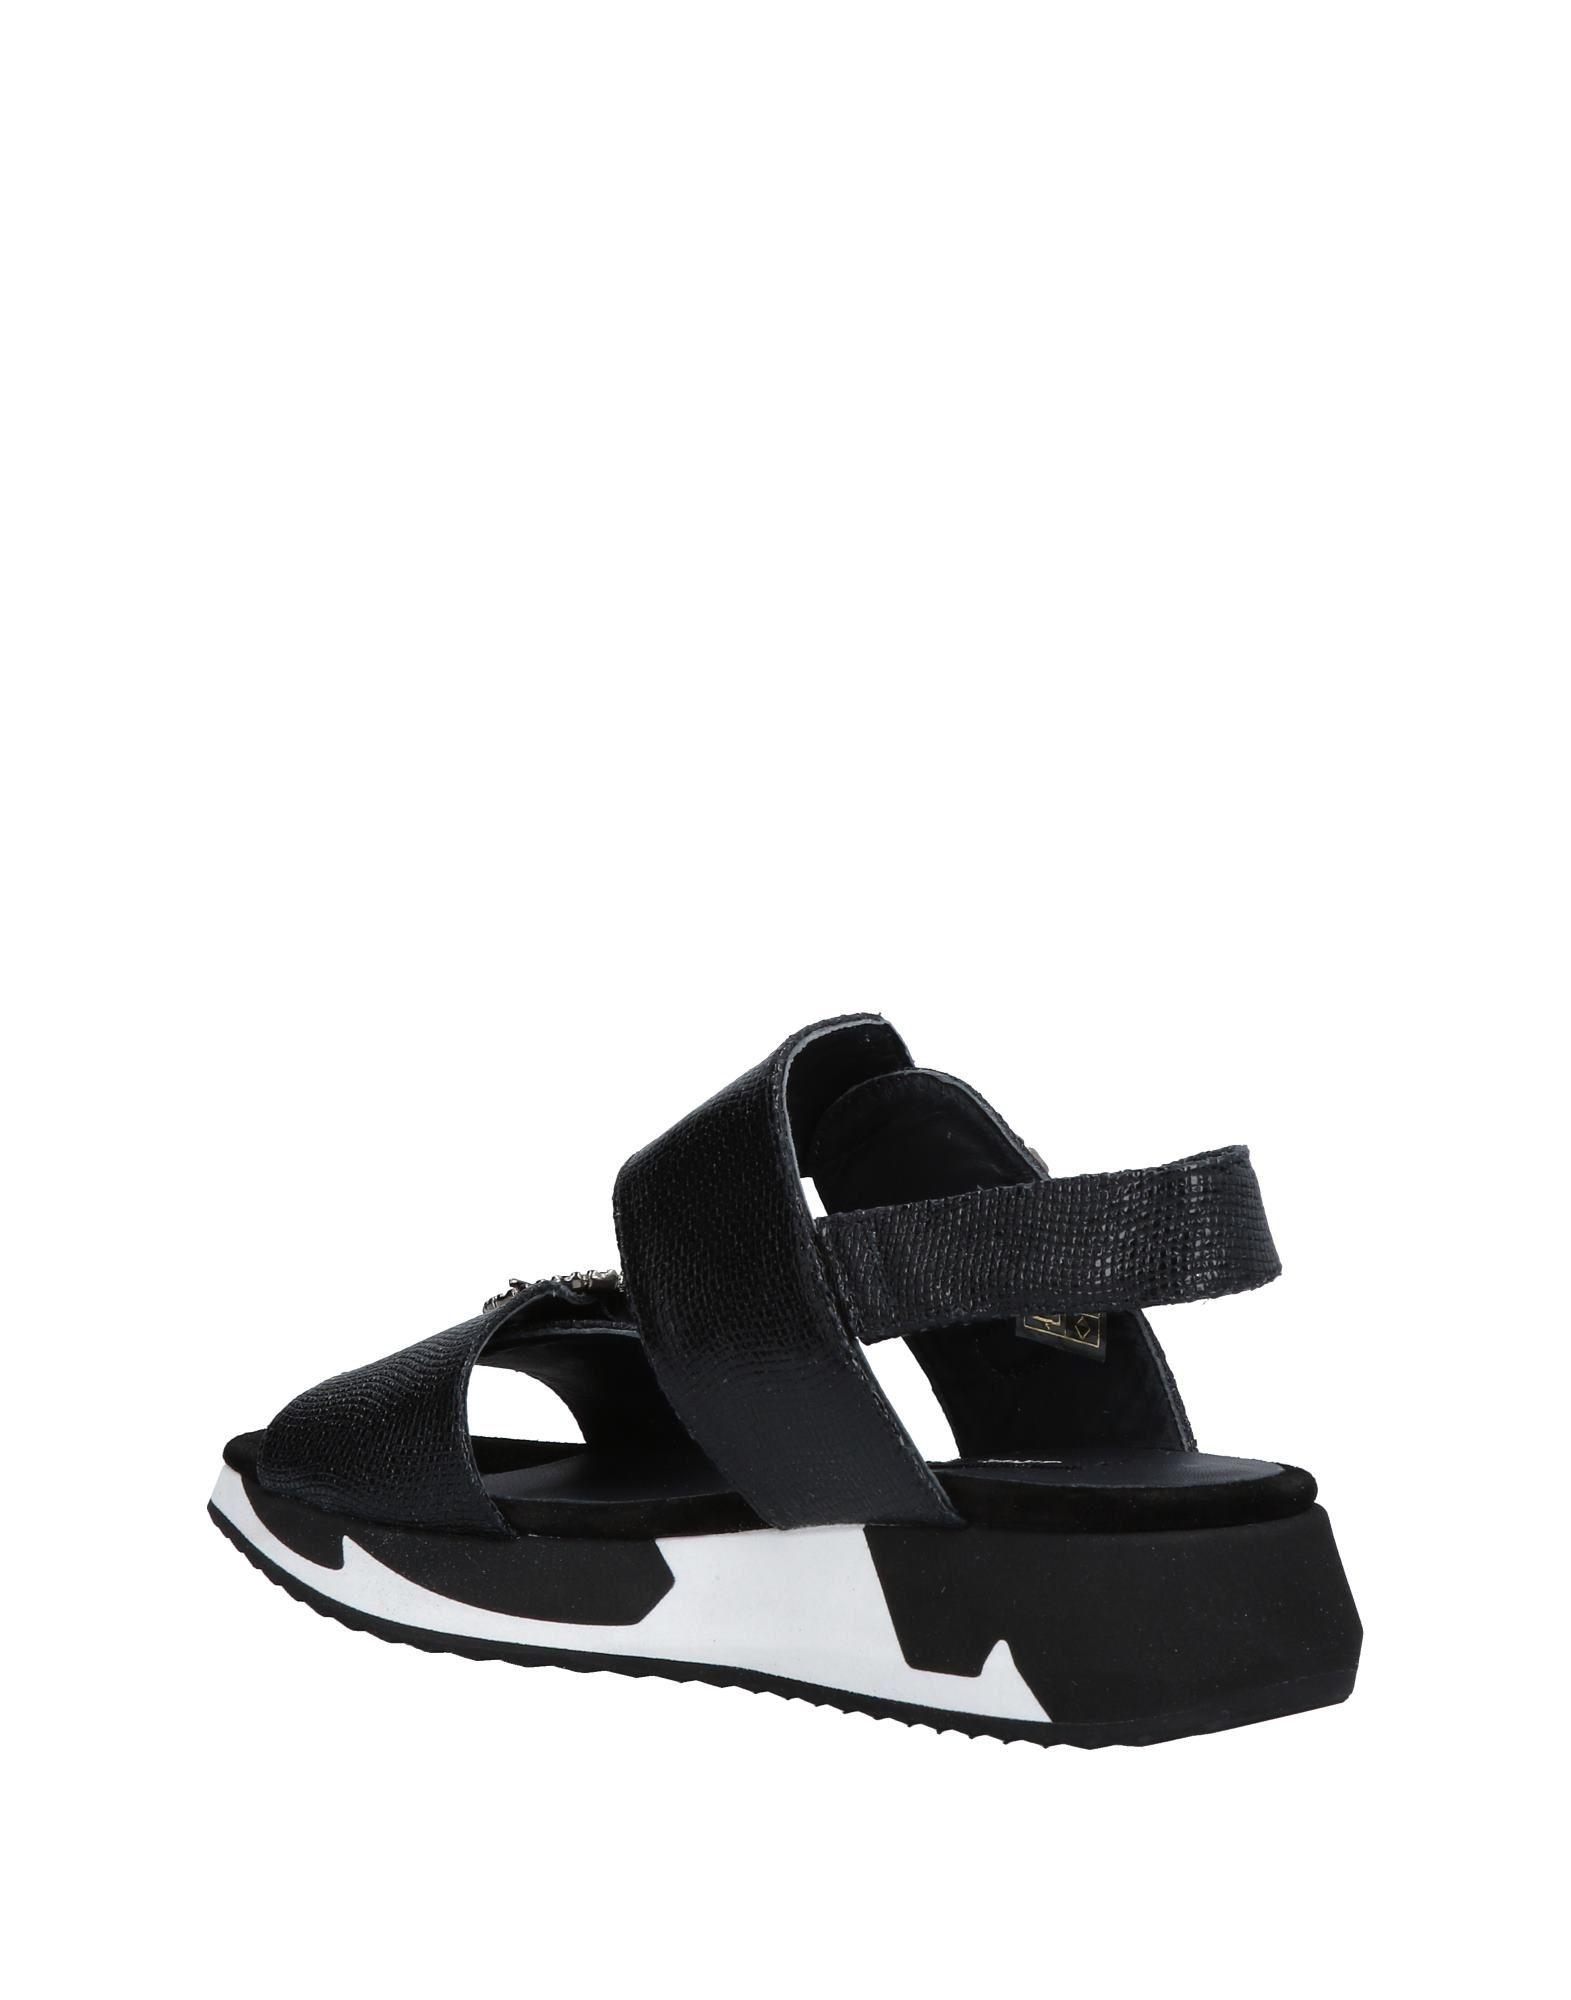 Stilvolle billige Schuhe Damen Zinda Sandalen Damen Schuhe  11471774UD 241bcb